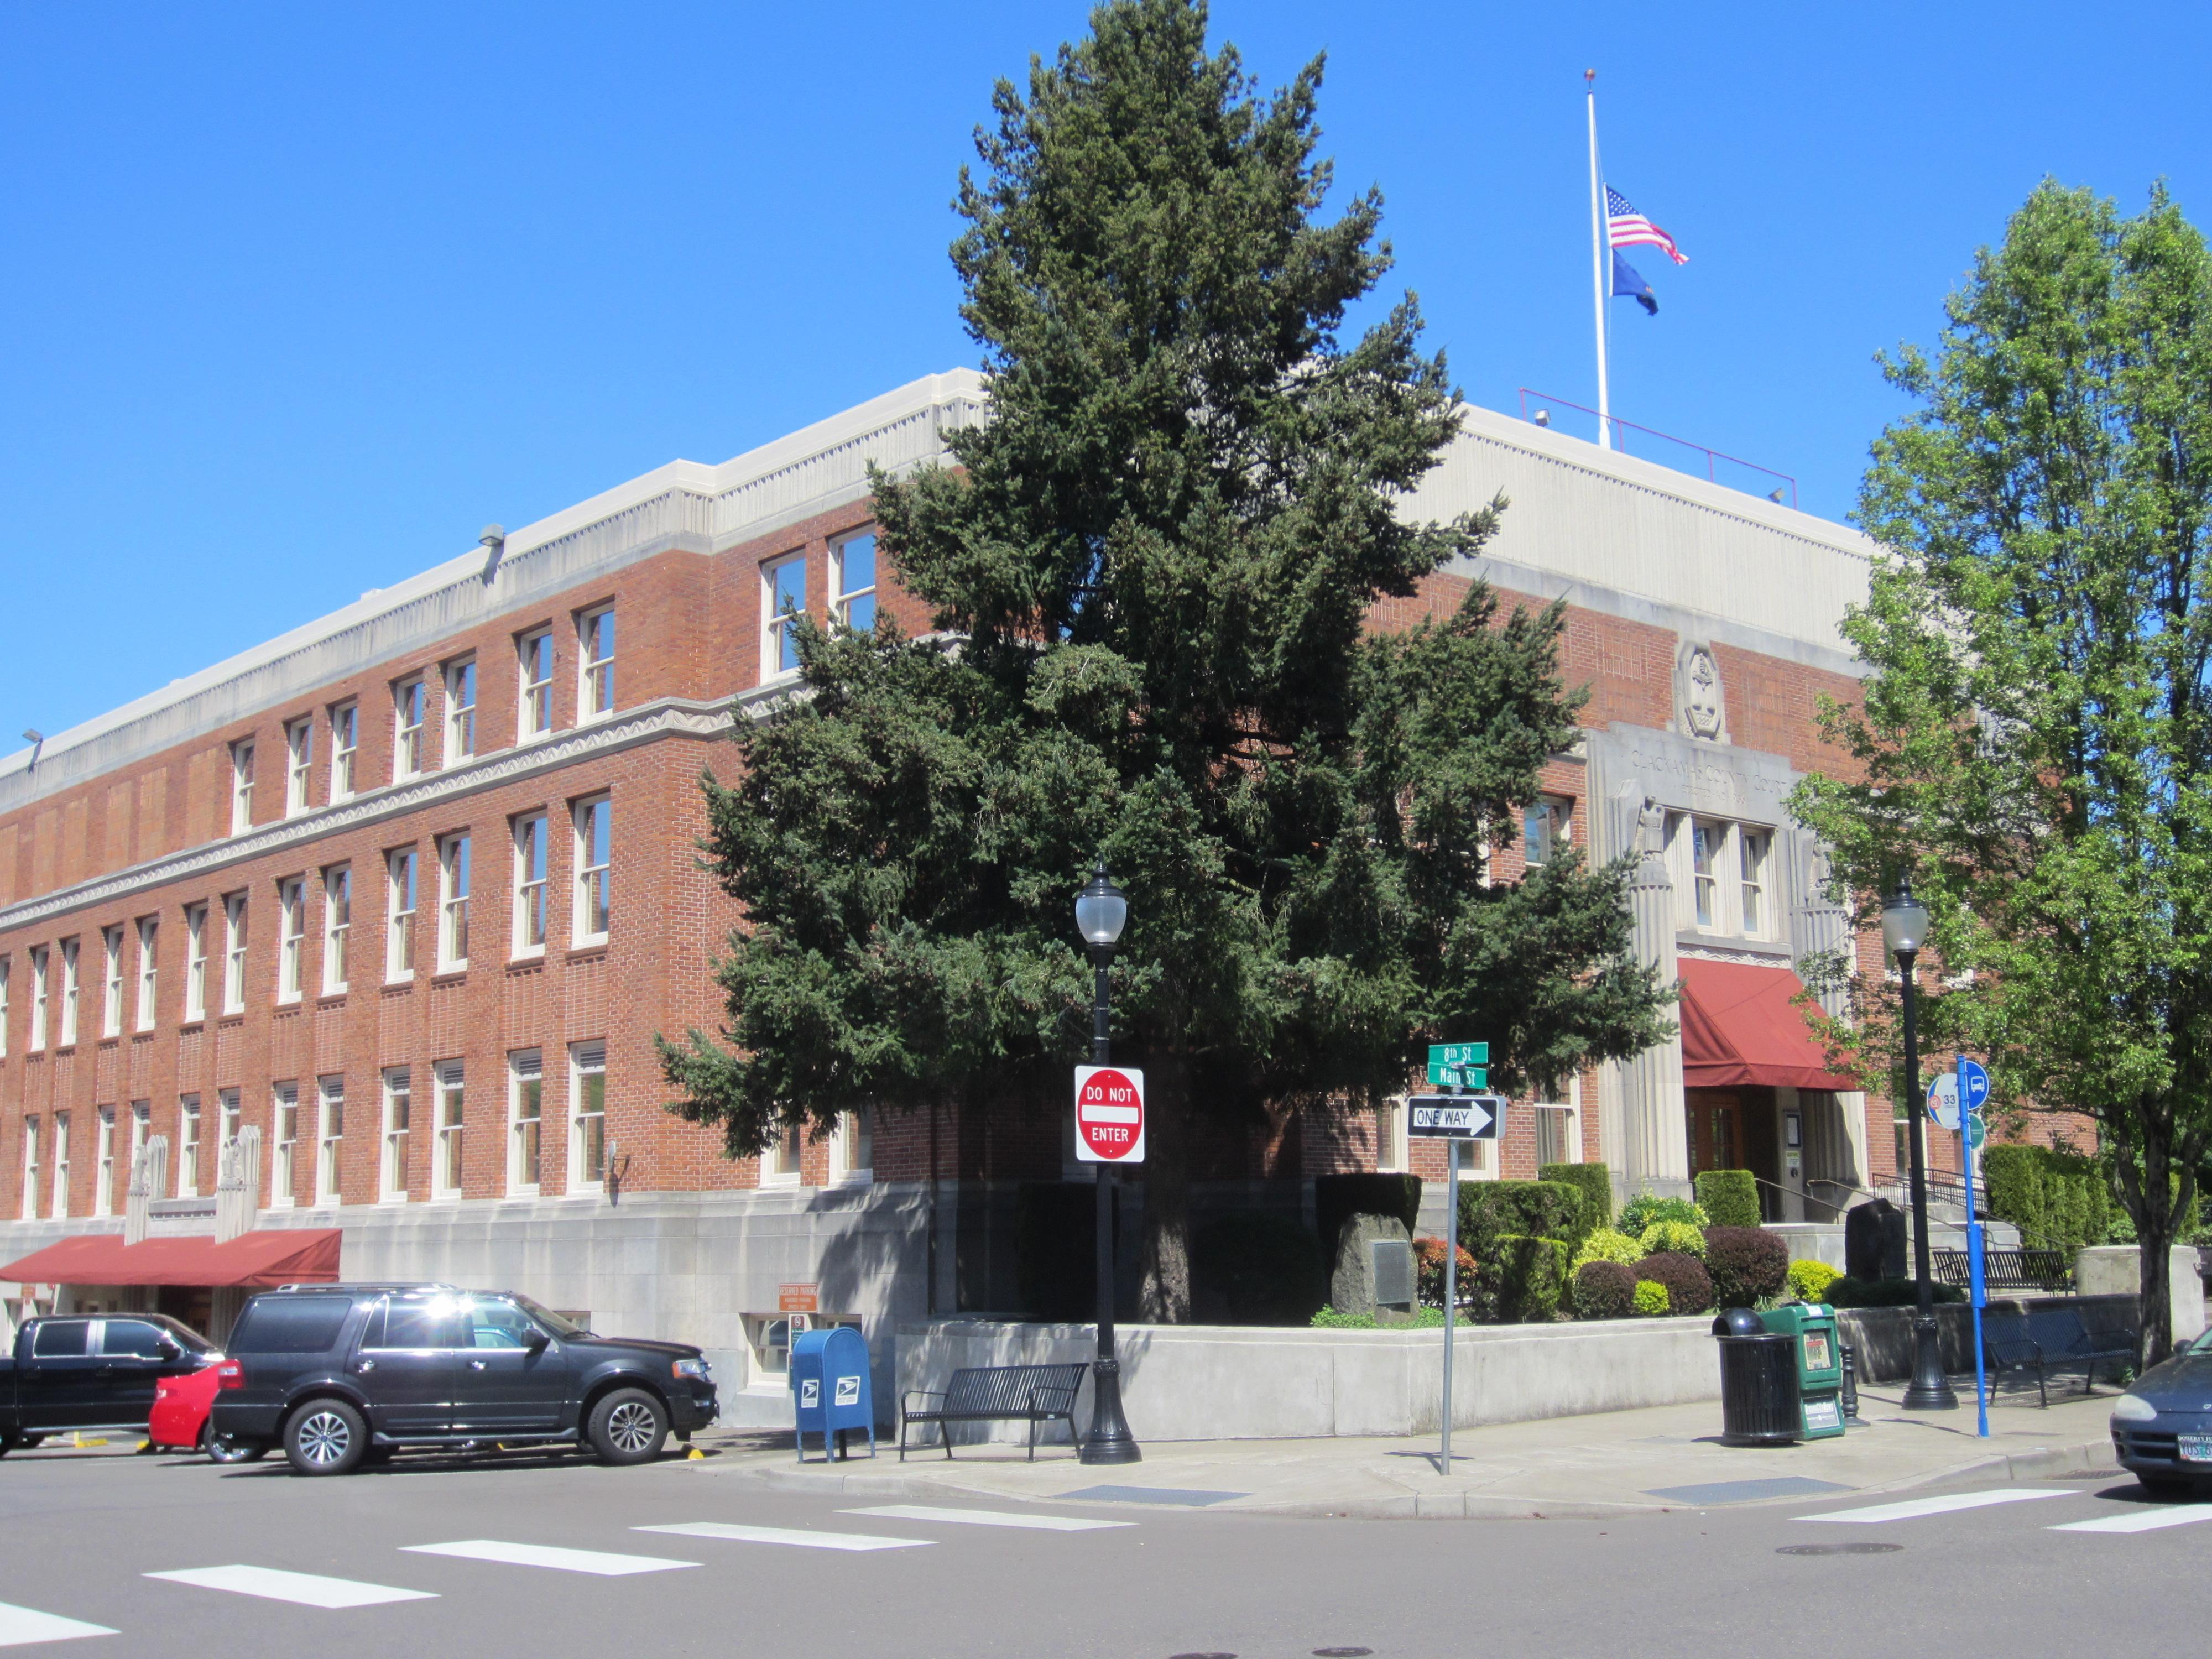 Clackamas County Courthouse - Wikipedia Pertaining To Clackamas County Courthouse Schedule